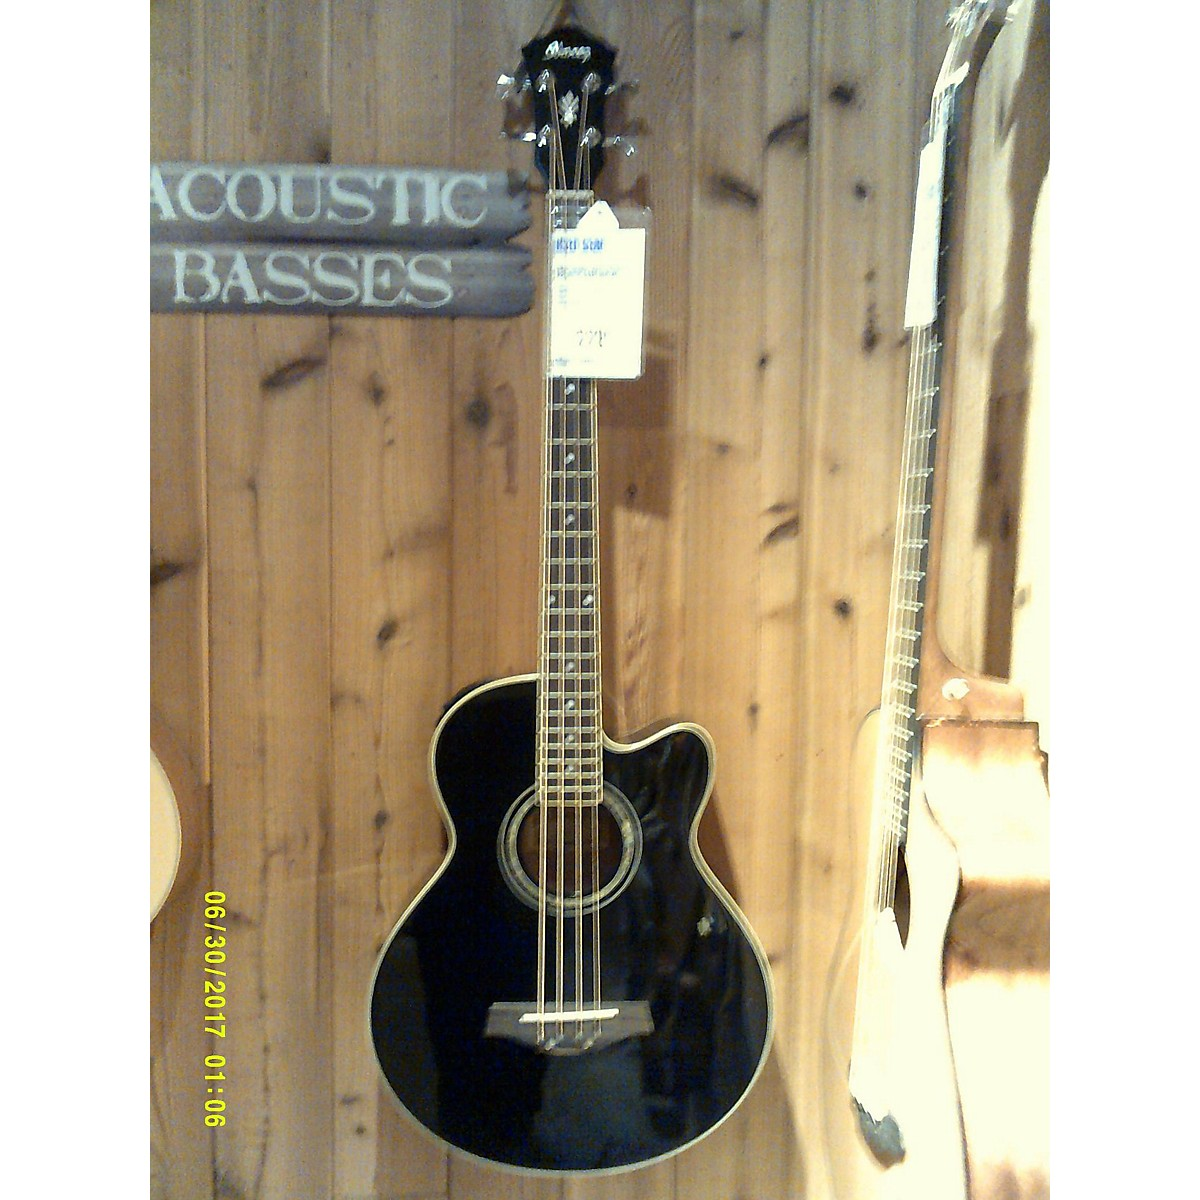 Ibanez AEB10 Acoustic Bass Guitar